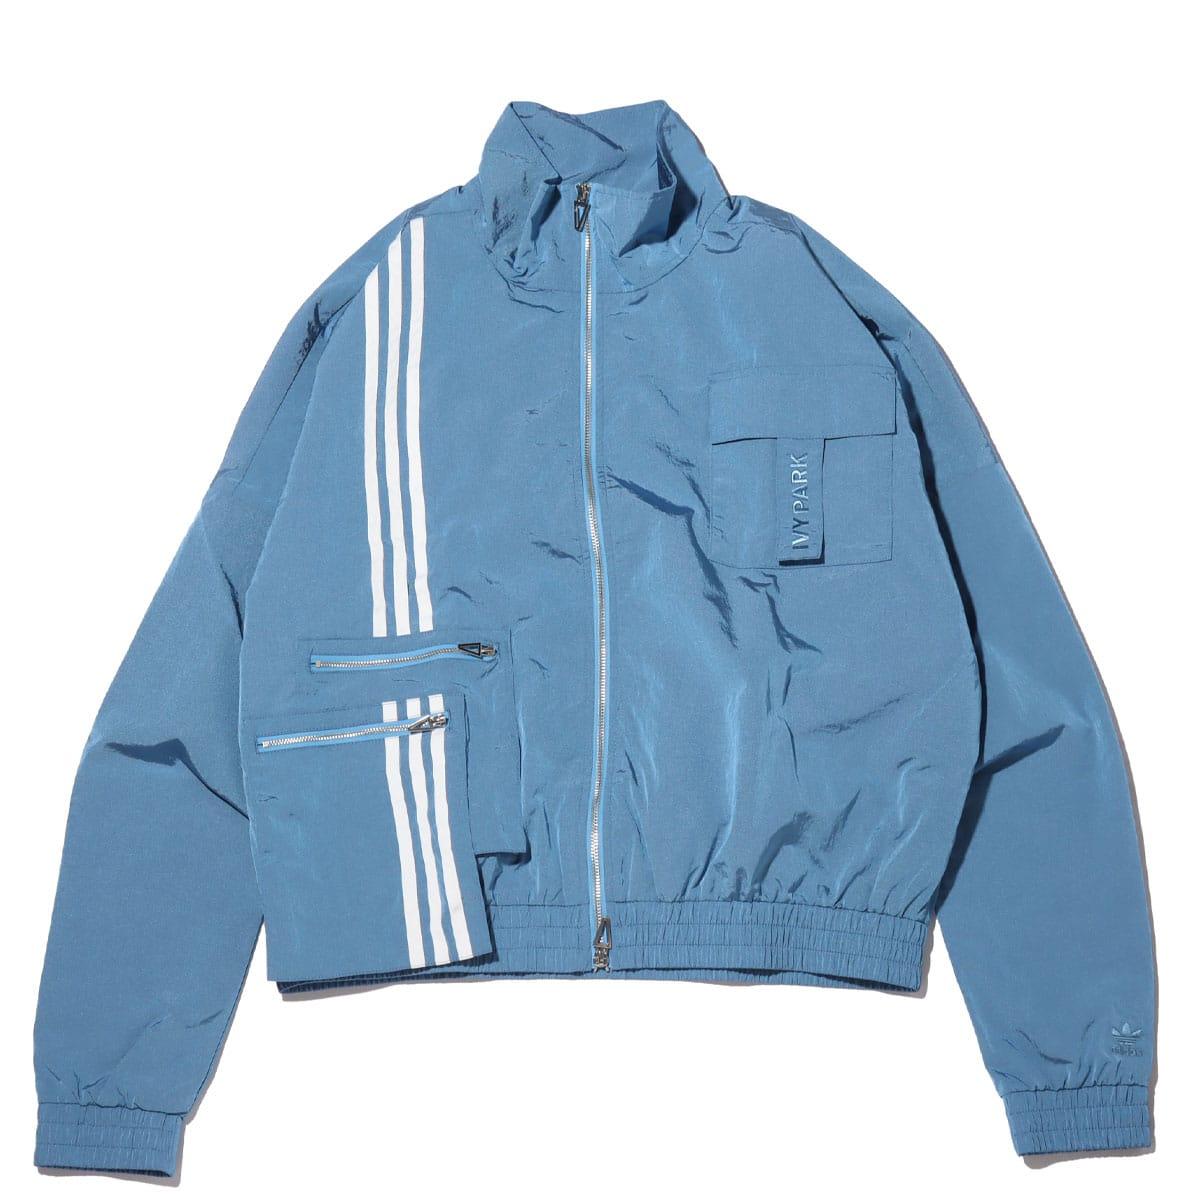 adidas IVP NYL JK 4ALL LIGHT BLUE 21SS-S_photo_large